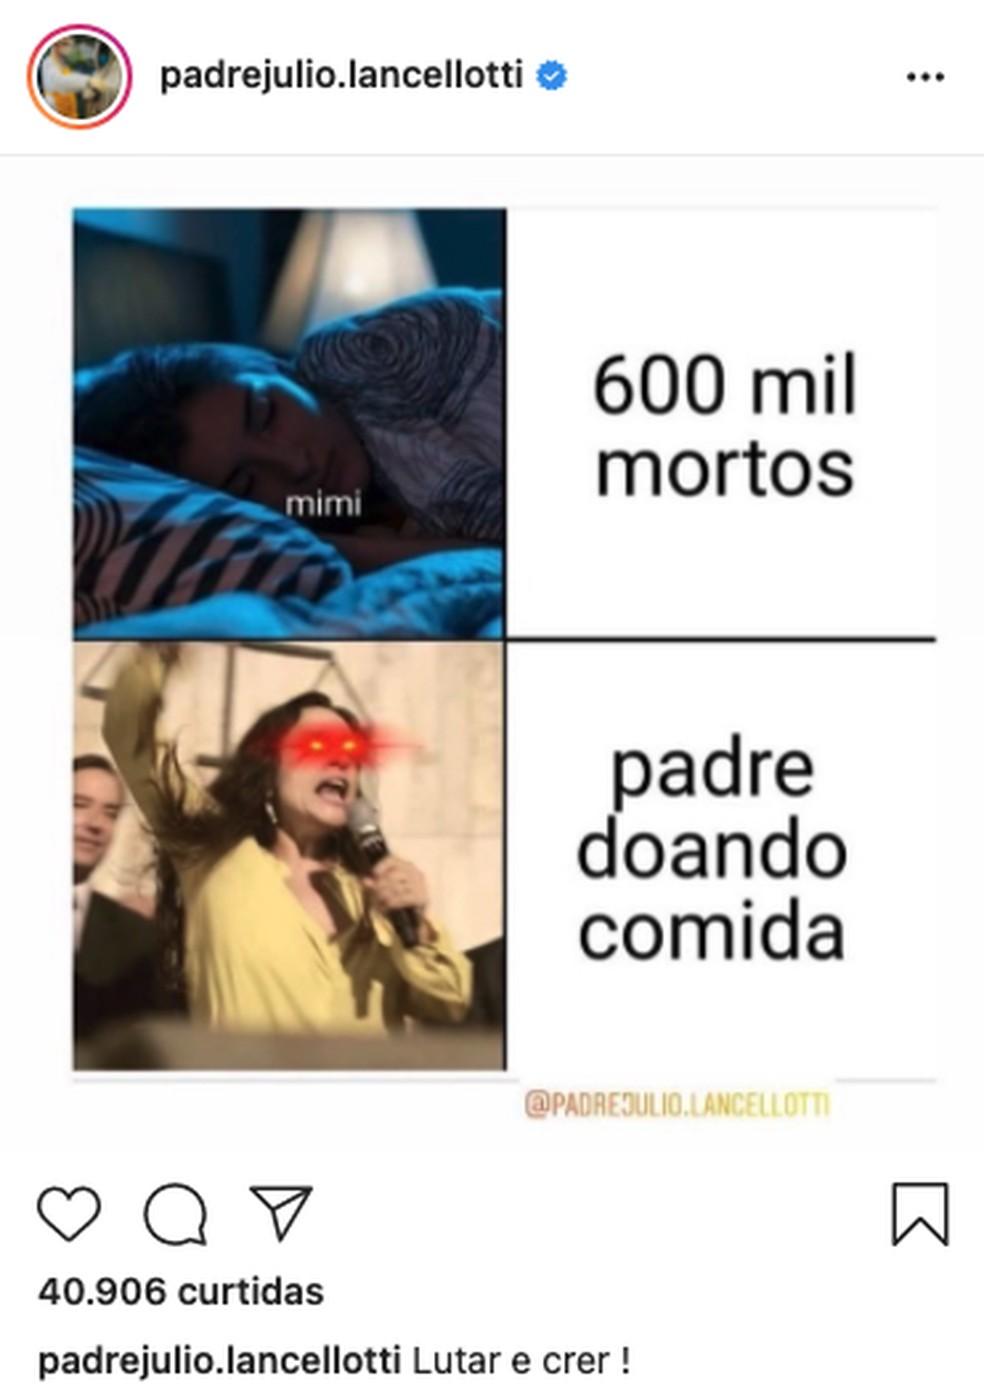 Padre Júlio Lancellotti publicou meme para rebater criticas da deputada estadual Janaina Paschoal — Foto: Reprodução